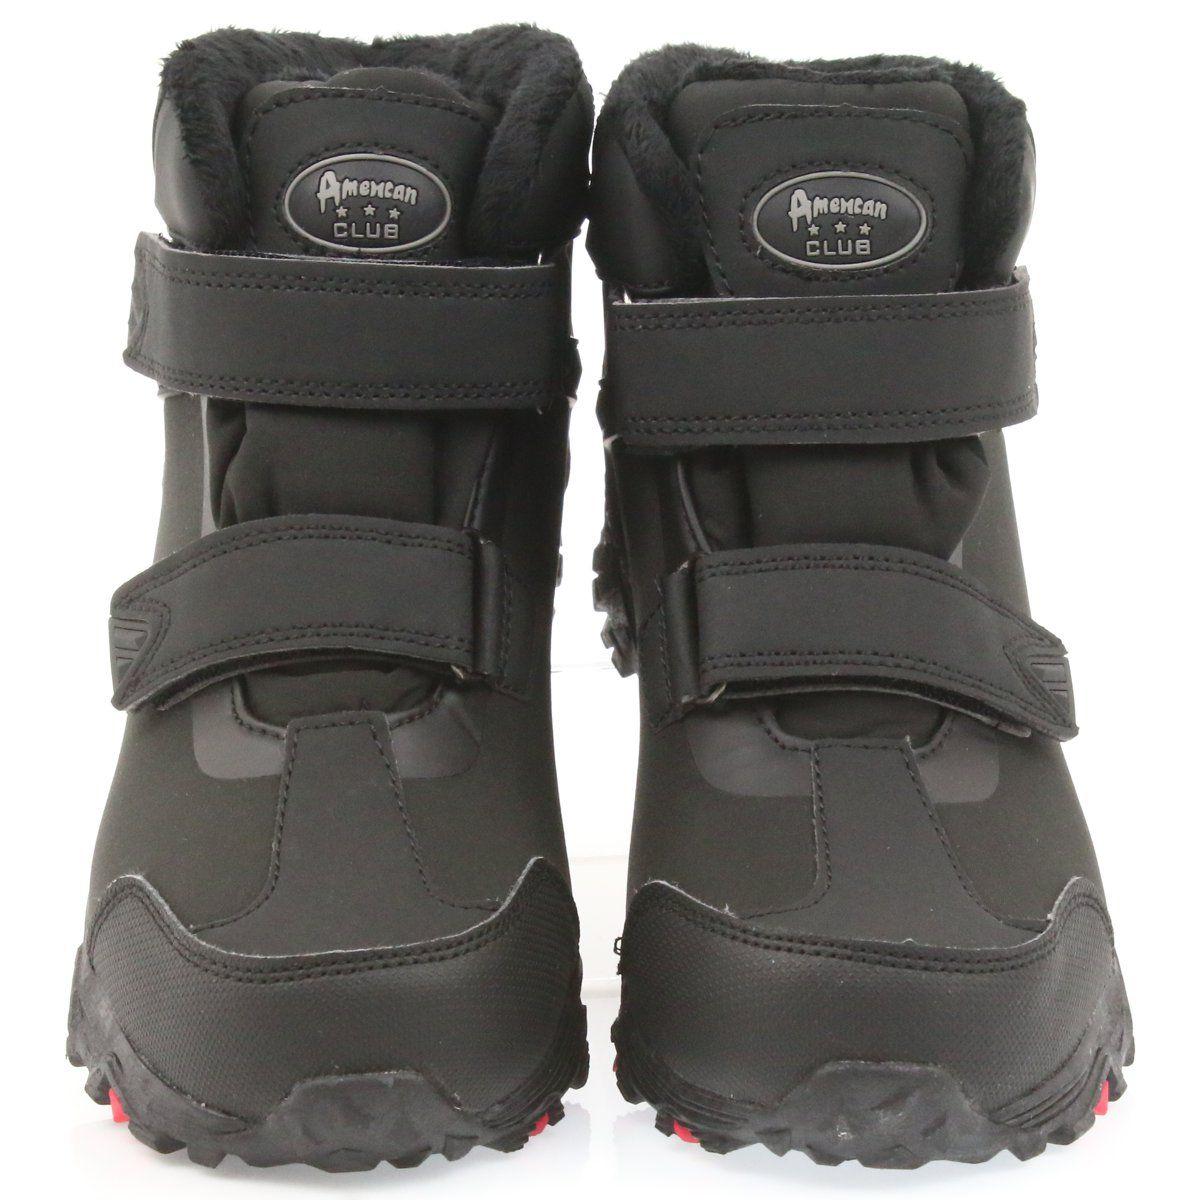 American Club American Trzewiki Buty Zimowe Z Membrana Czarne Boots Winter Boot Softshell